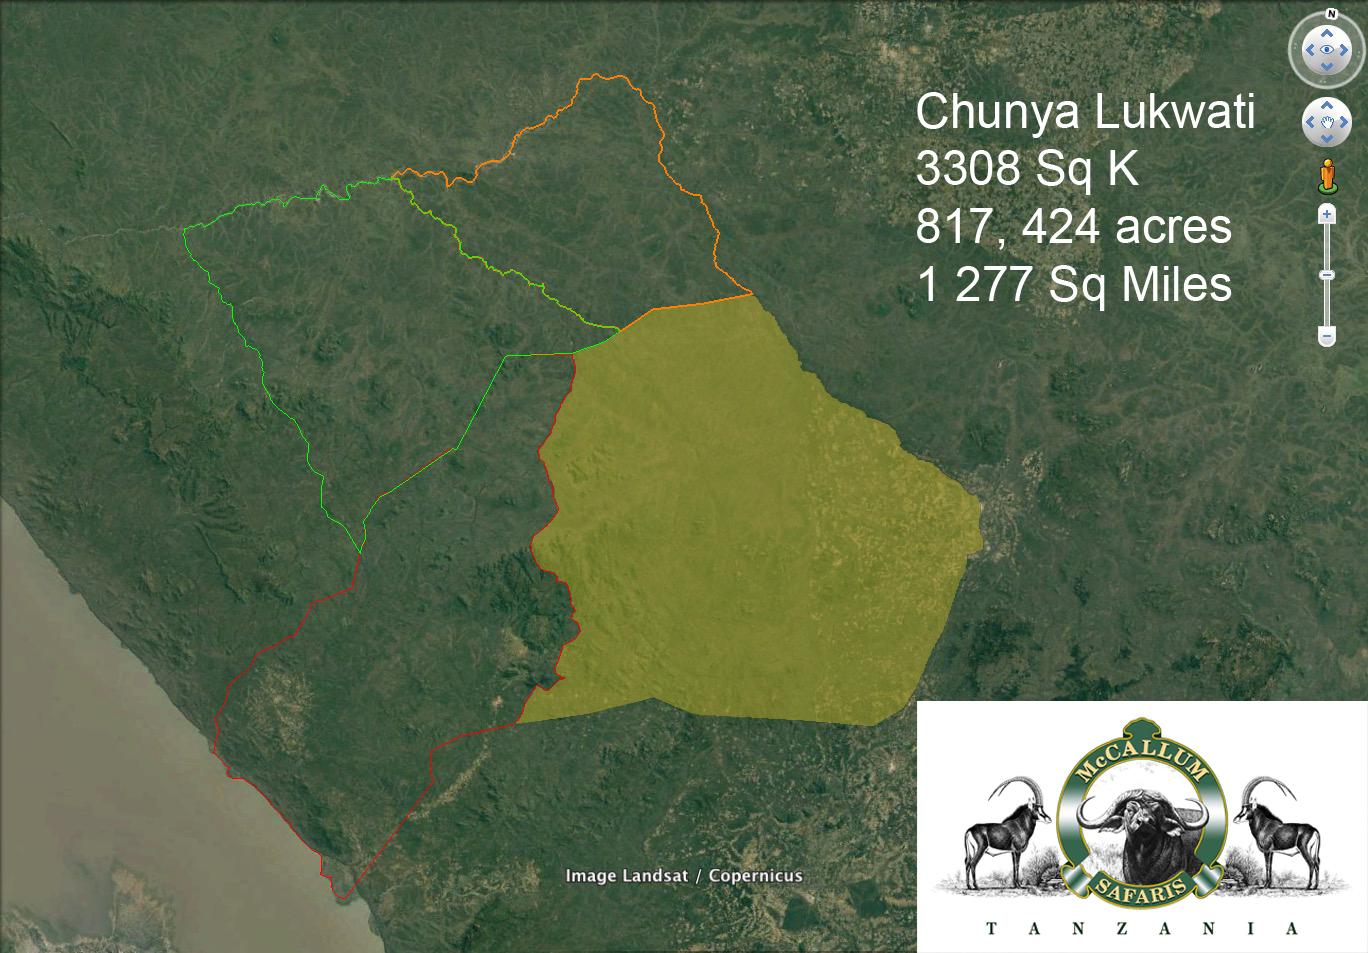 Chunya Lukwati